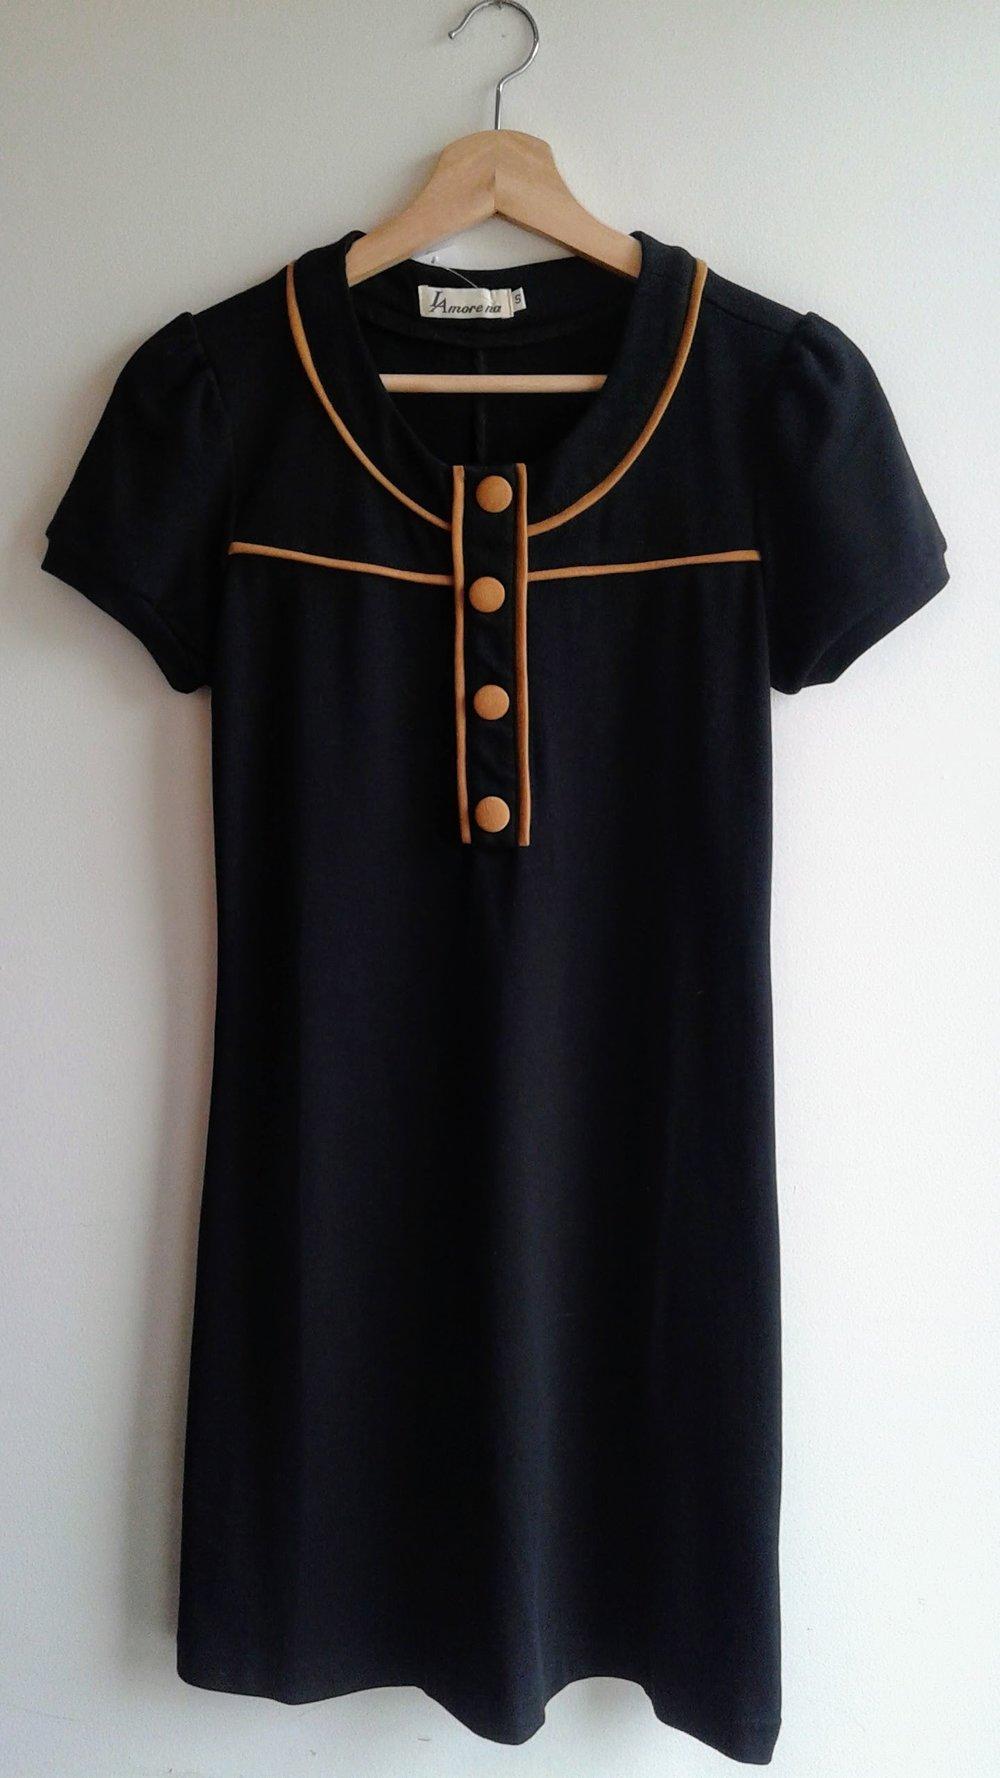 L'Amorena dress; Size S, $28